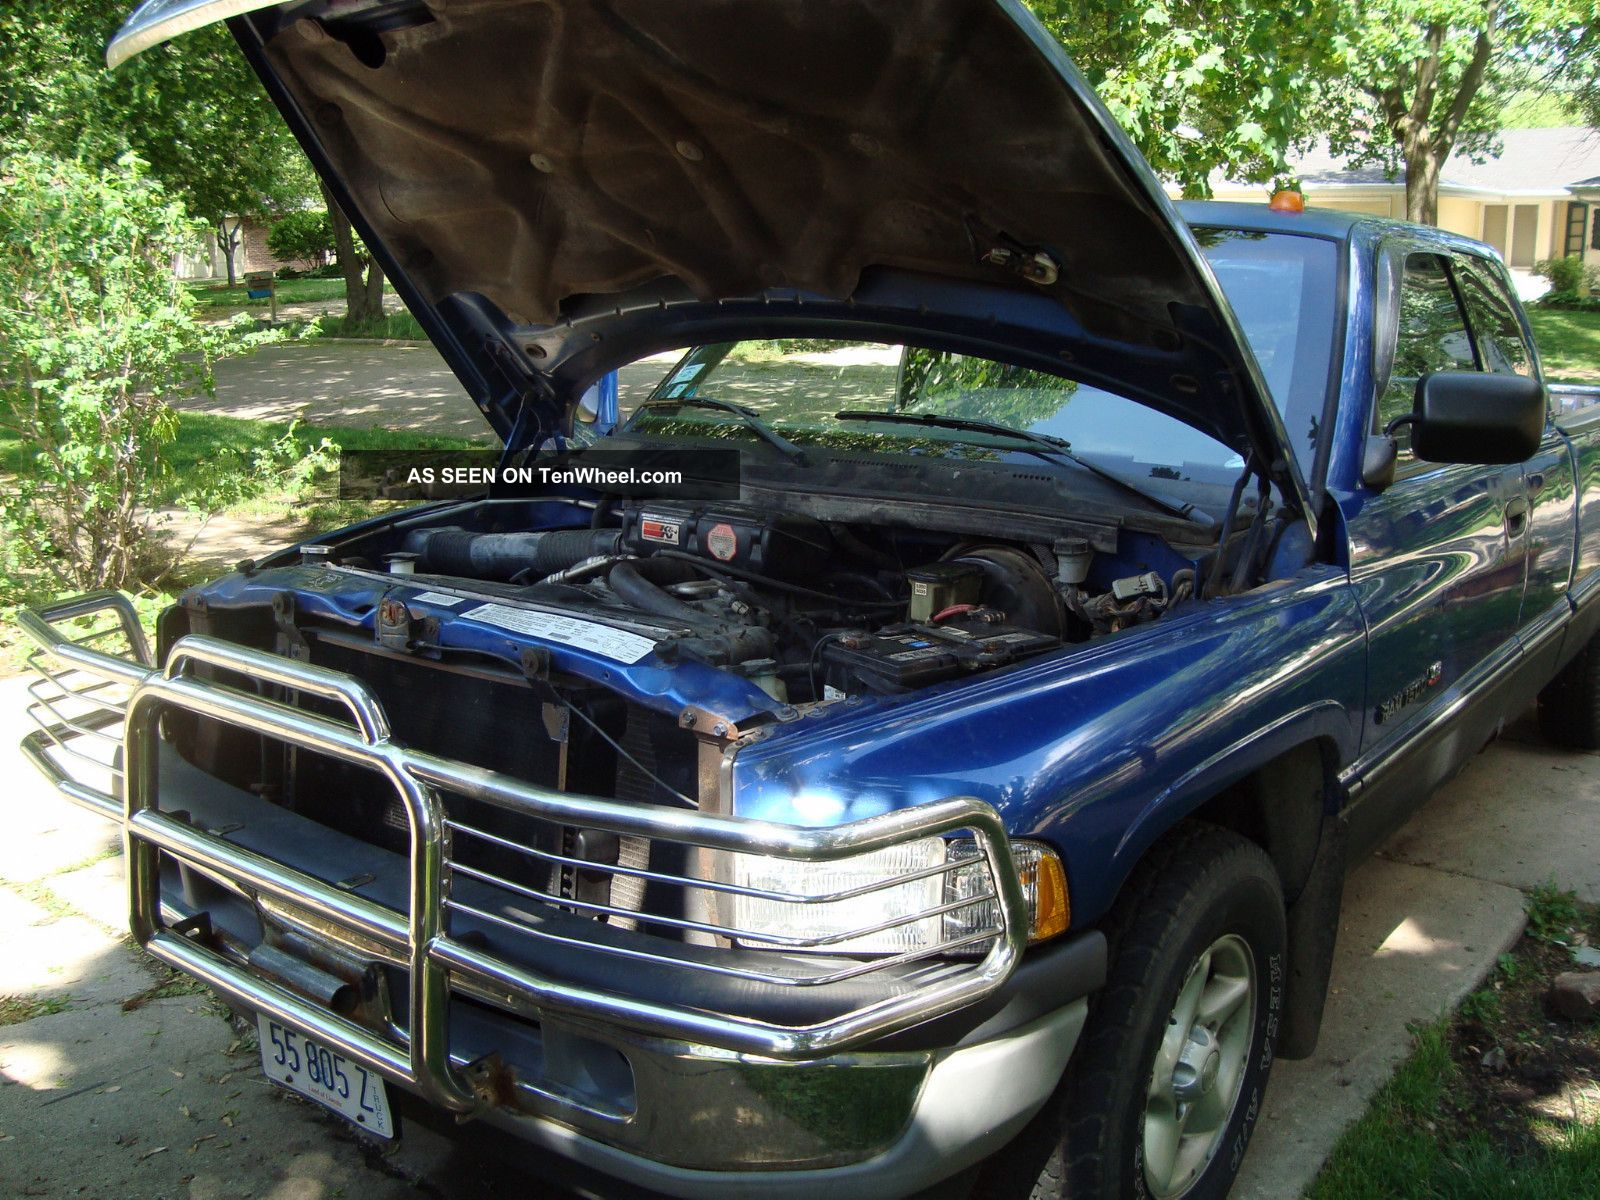 1996 Dodge Ram1500 Laramie Slt 2 Door W Brush Guard & Beeping Backup Alarm Ram 1500 photo